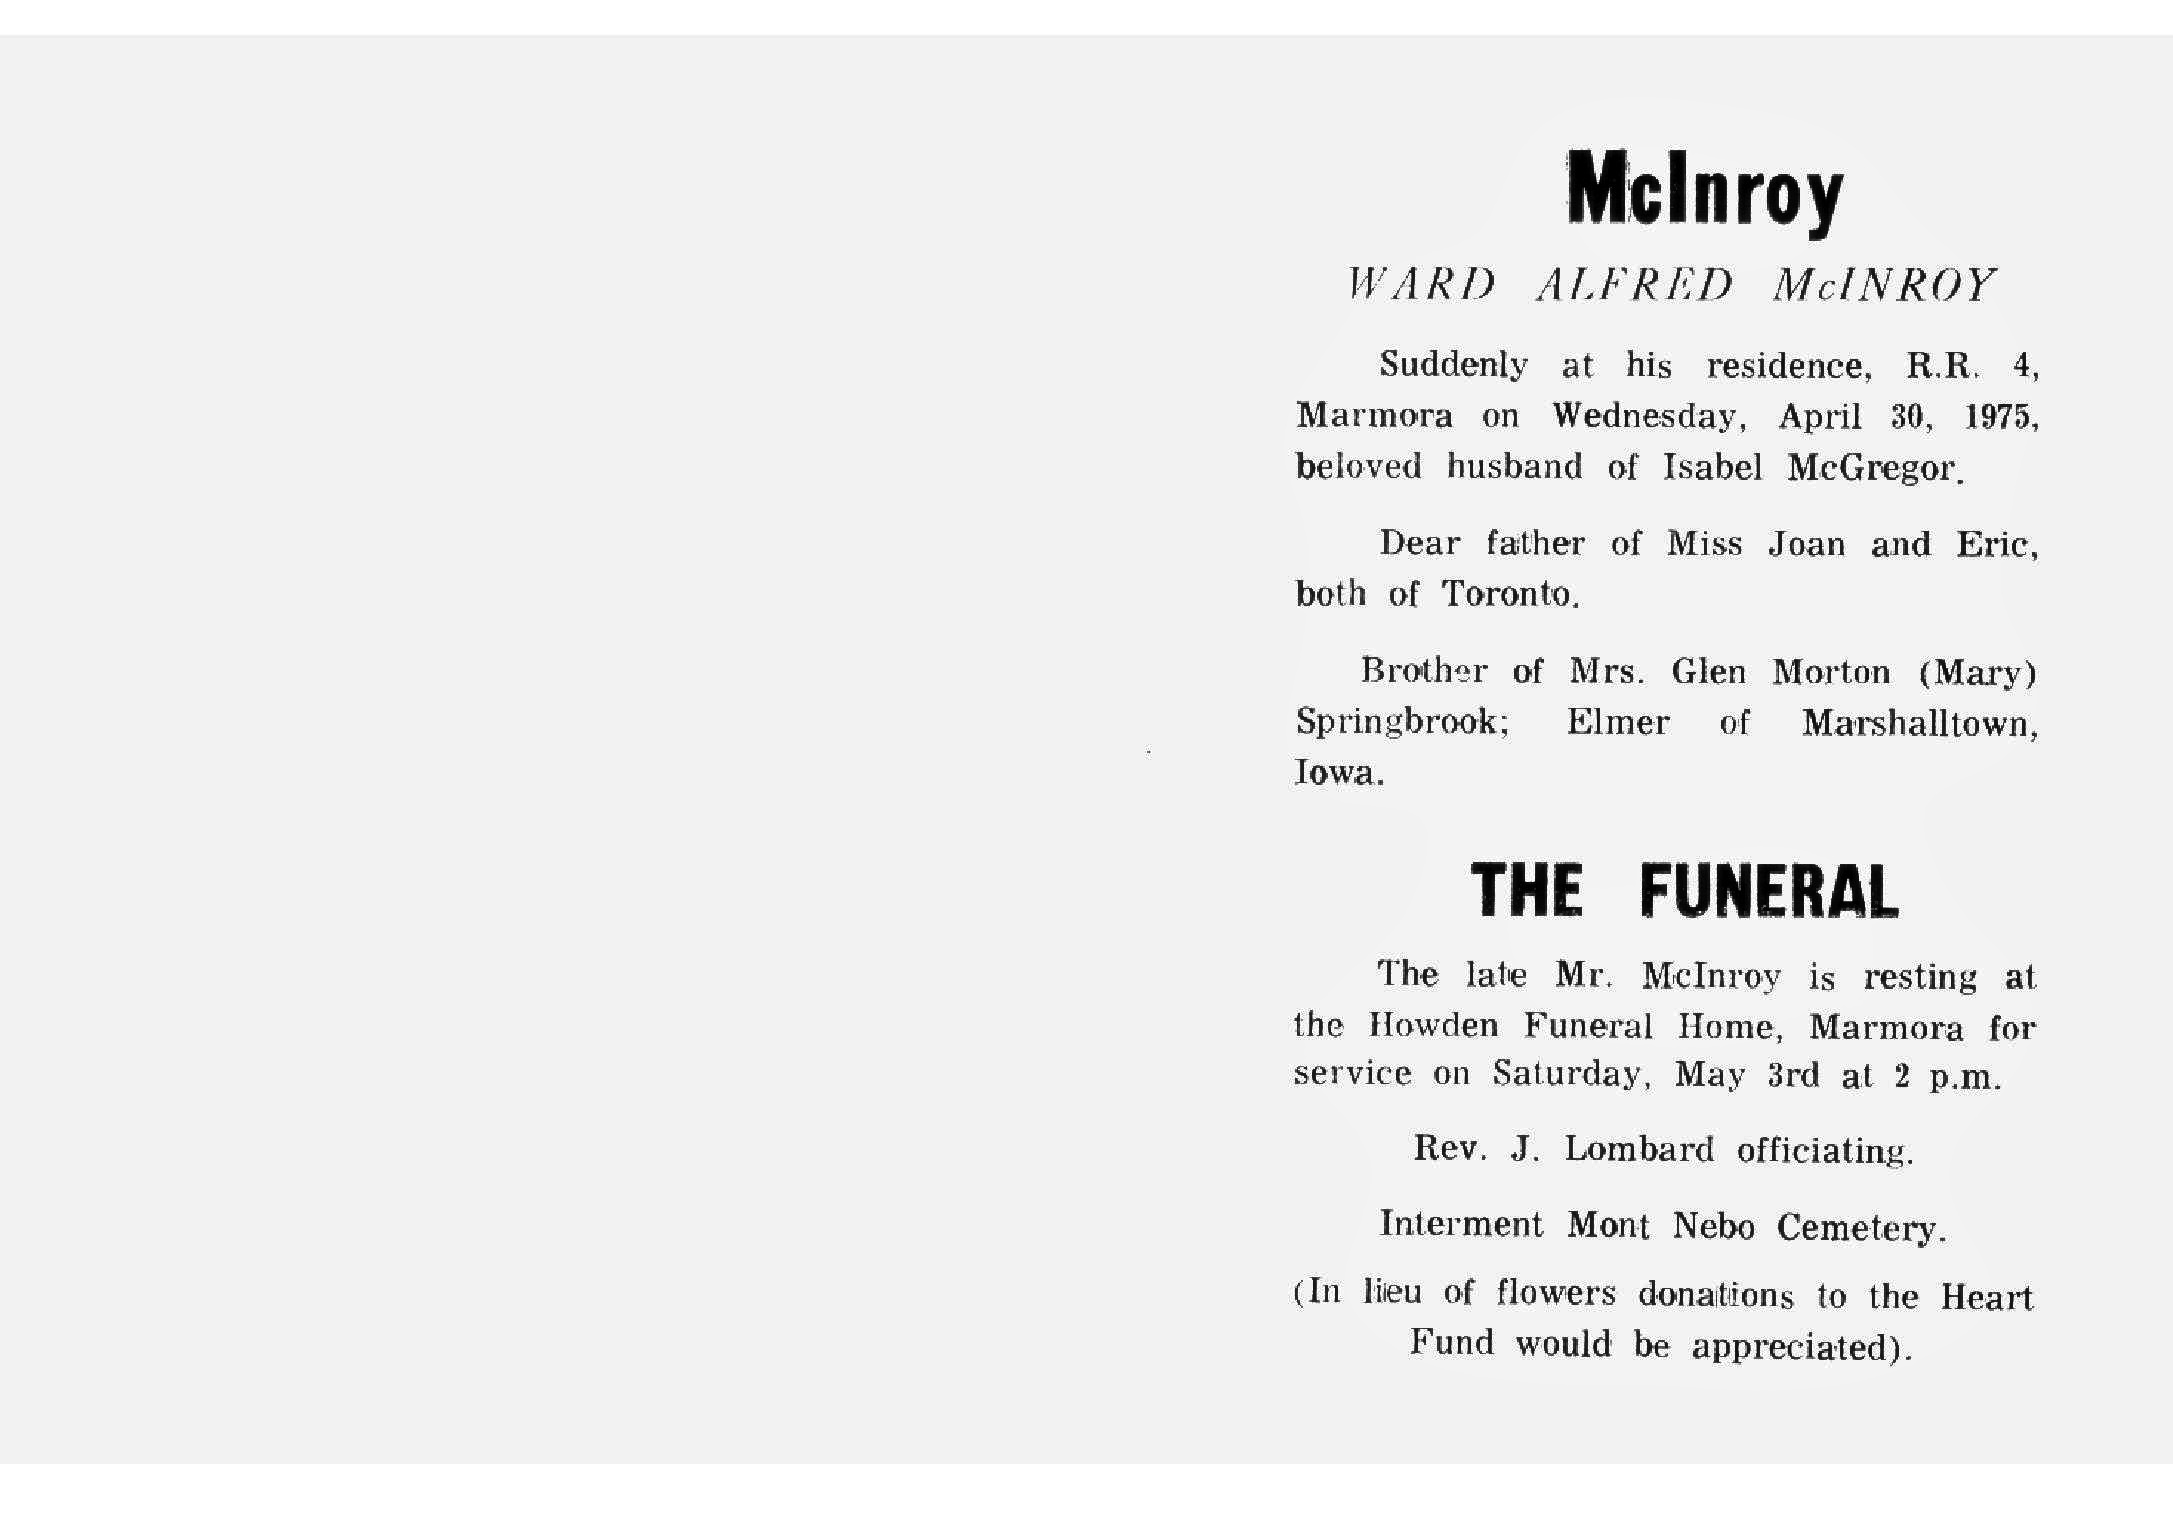 McInroy,  Ward Alfred.jpg